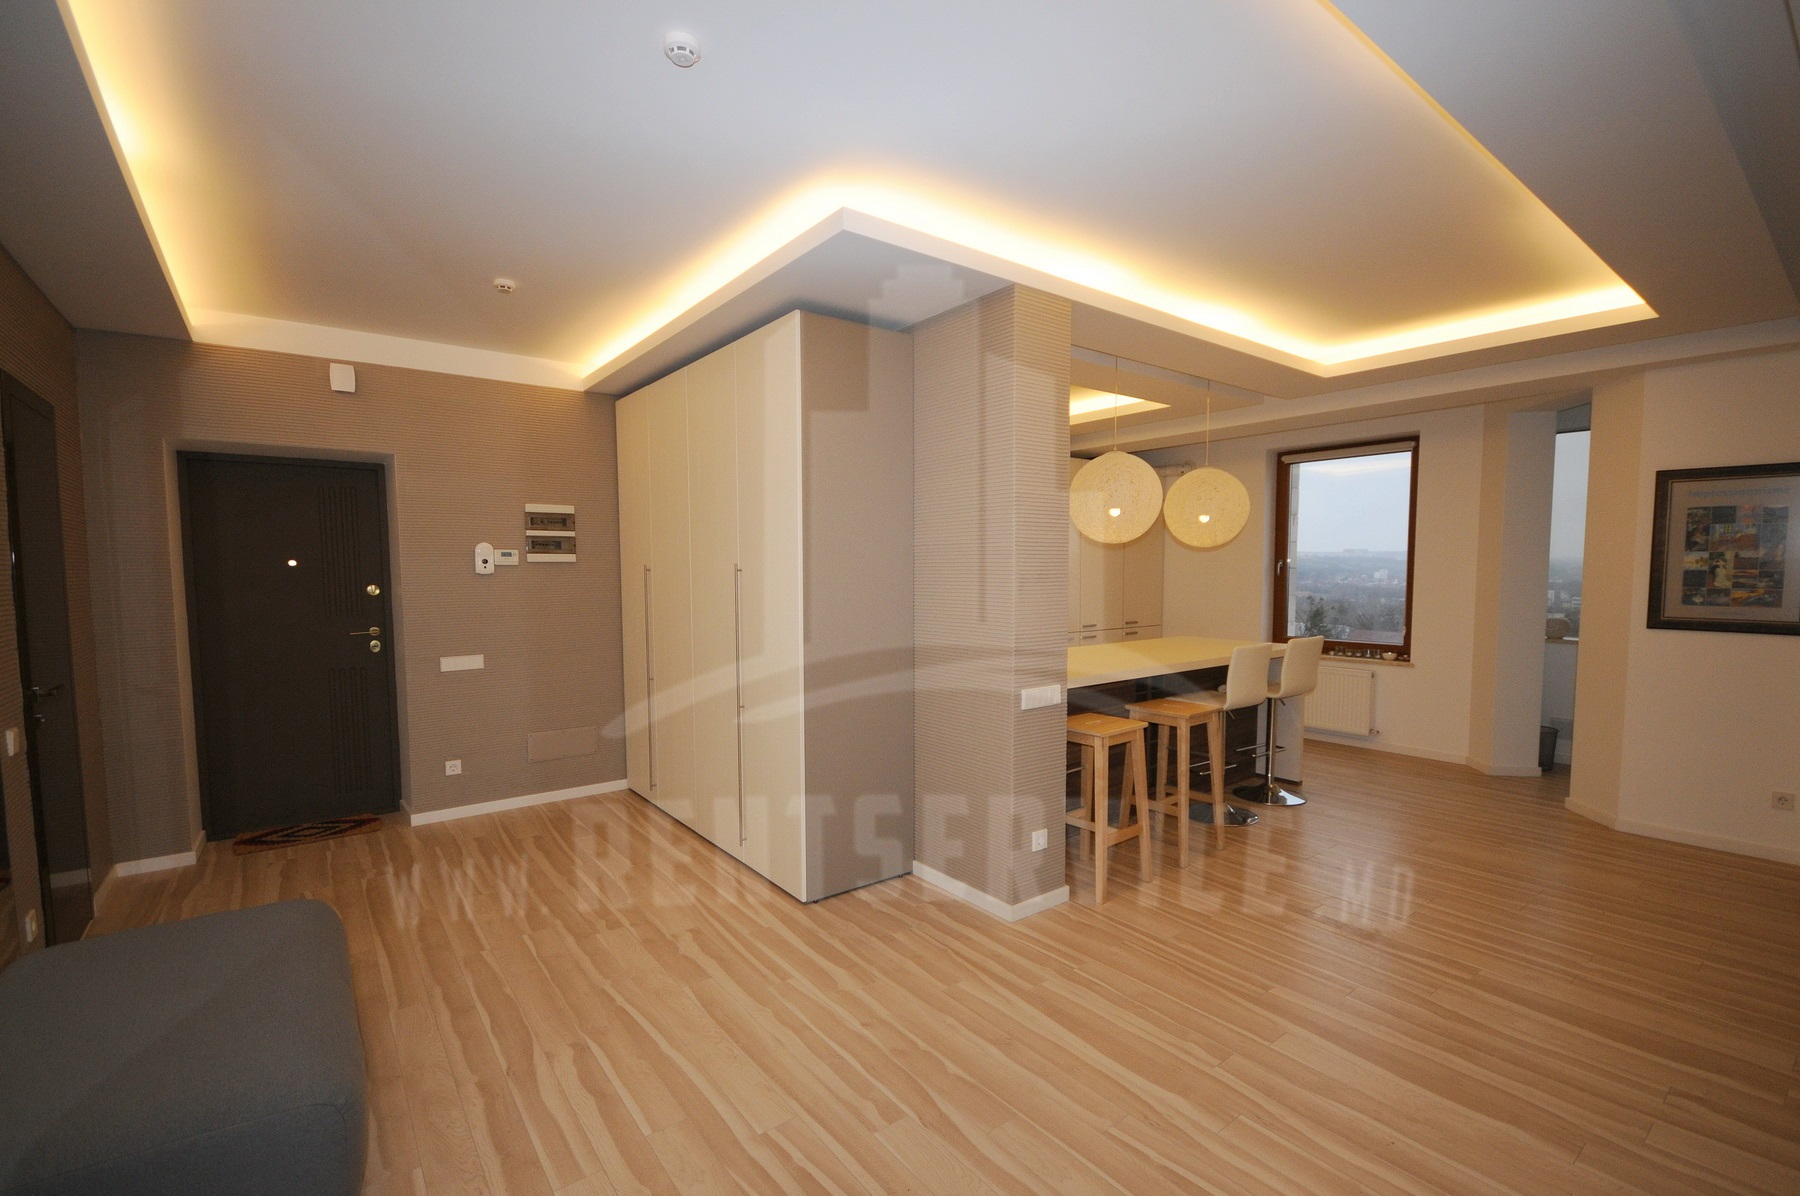 2060_apartment_9.JPG